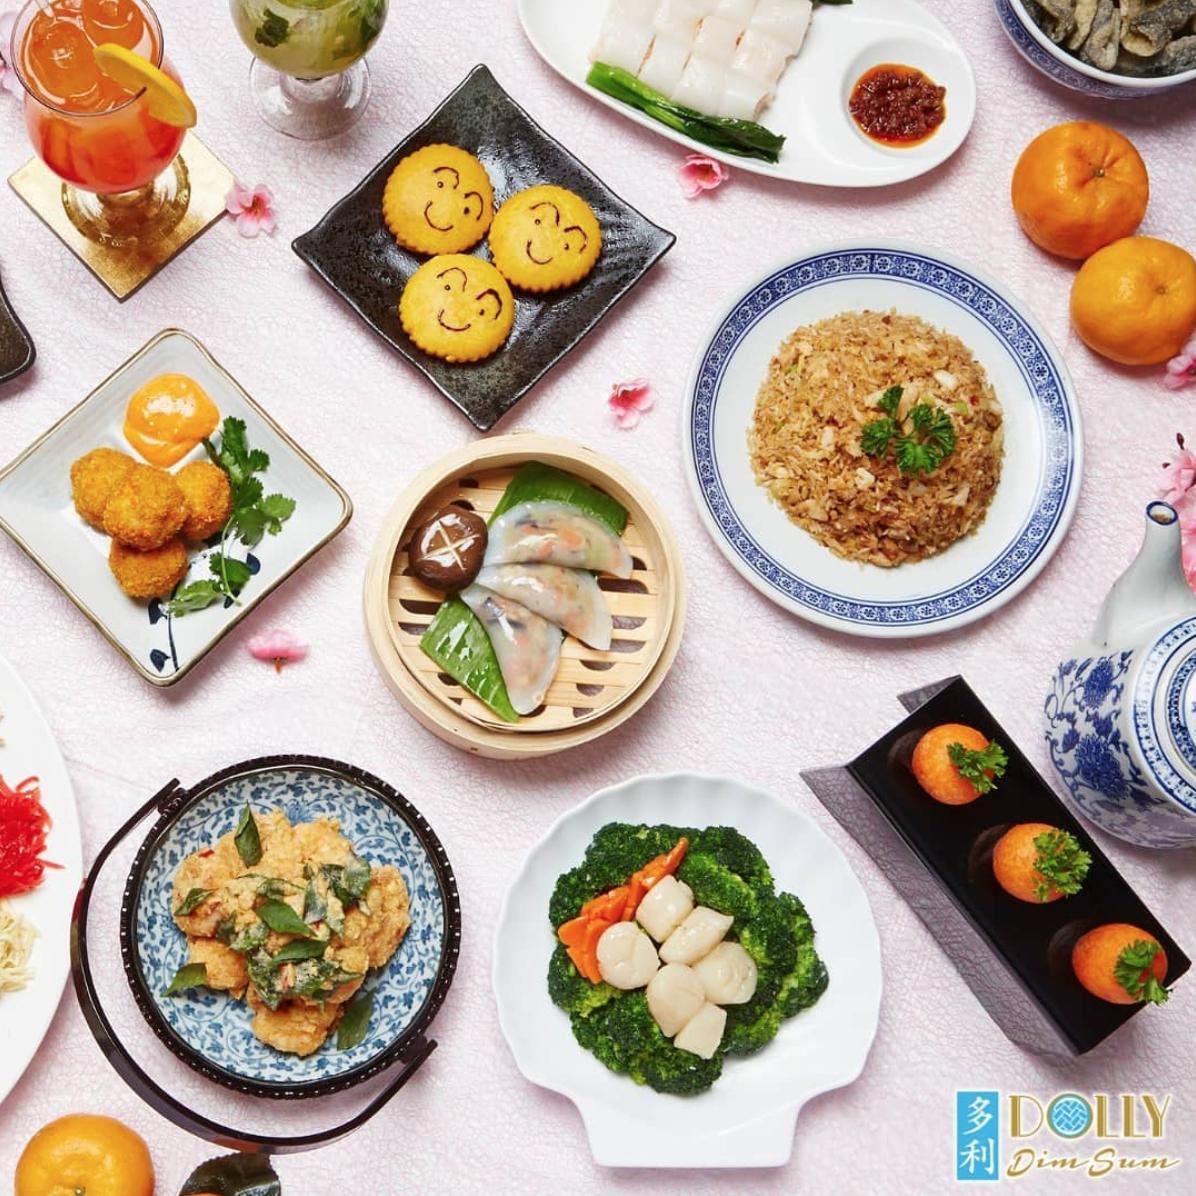 Dolly Dim Sum Halal food KL Malaysia Kuala Lumpur